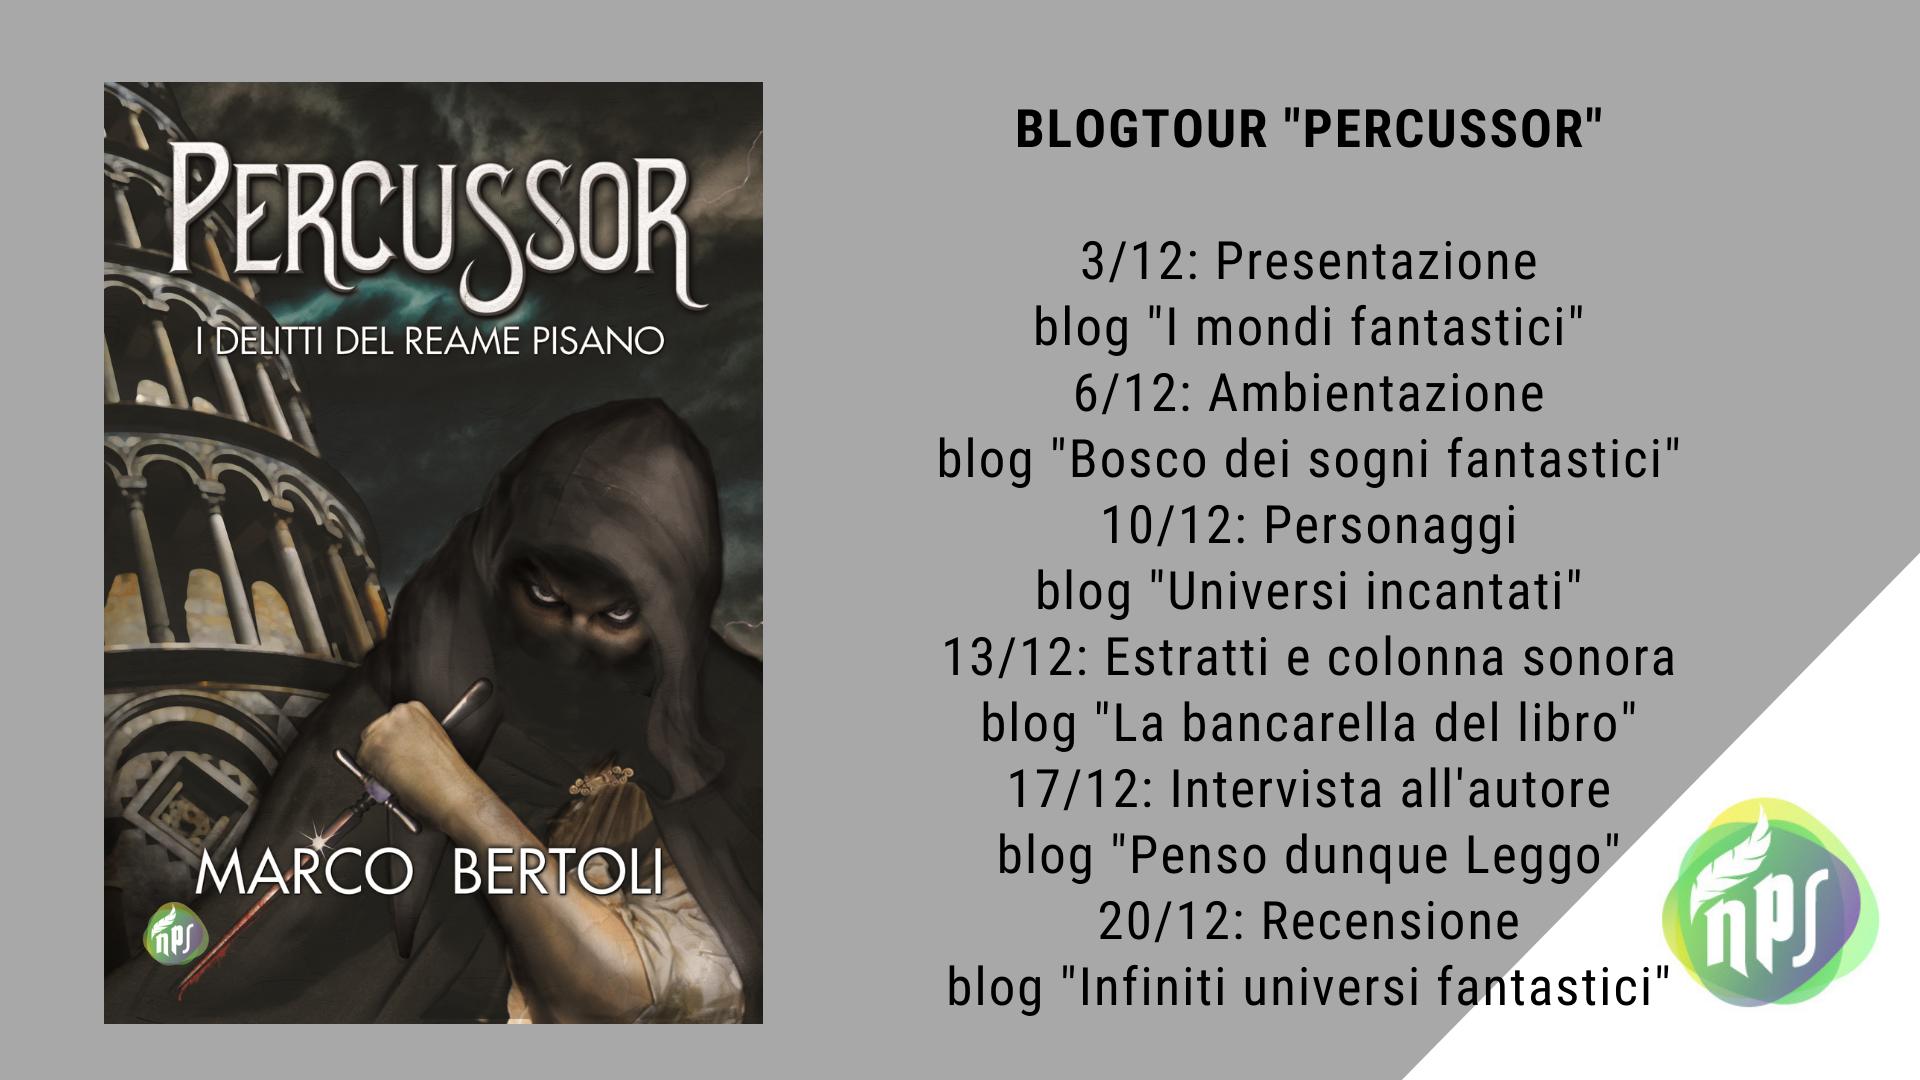 Blogtour Percussor